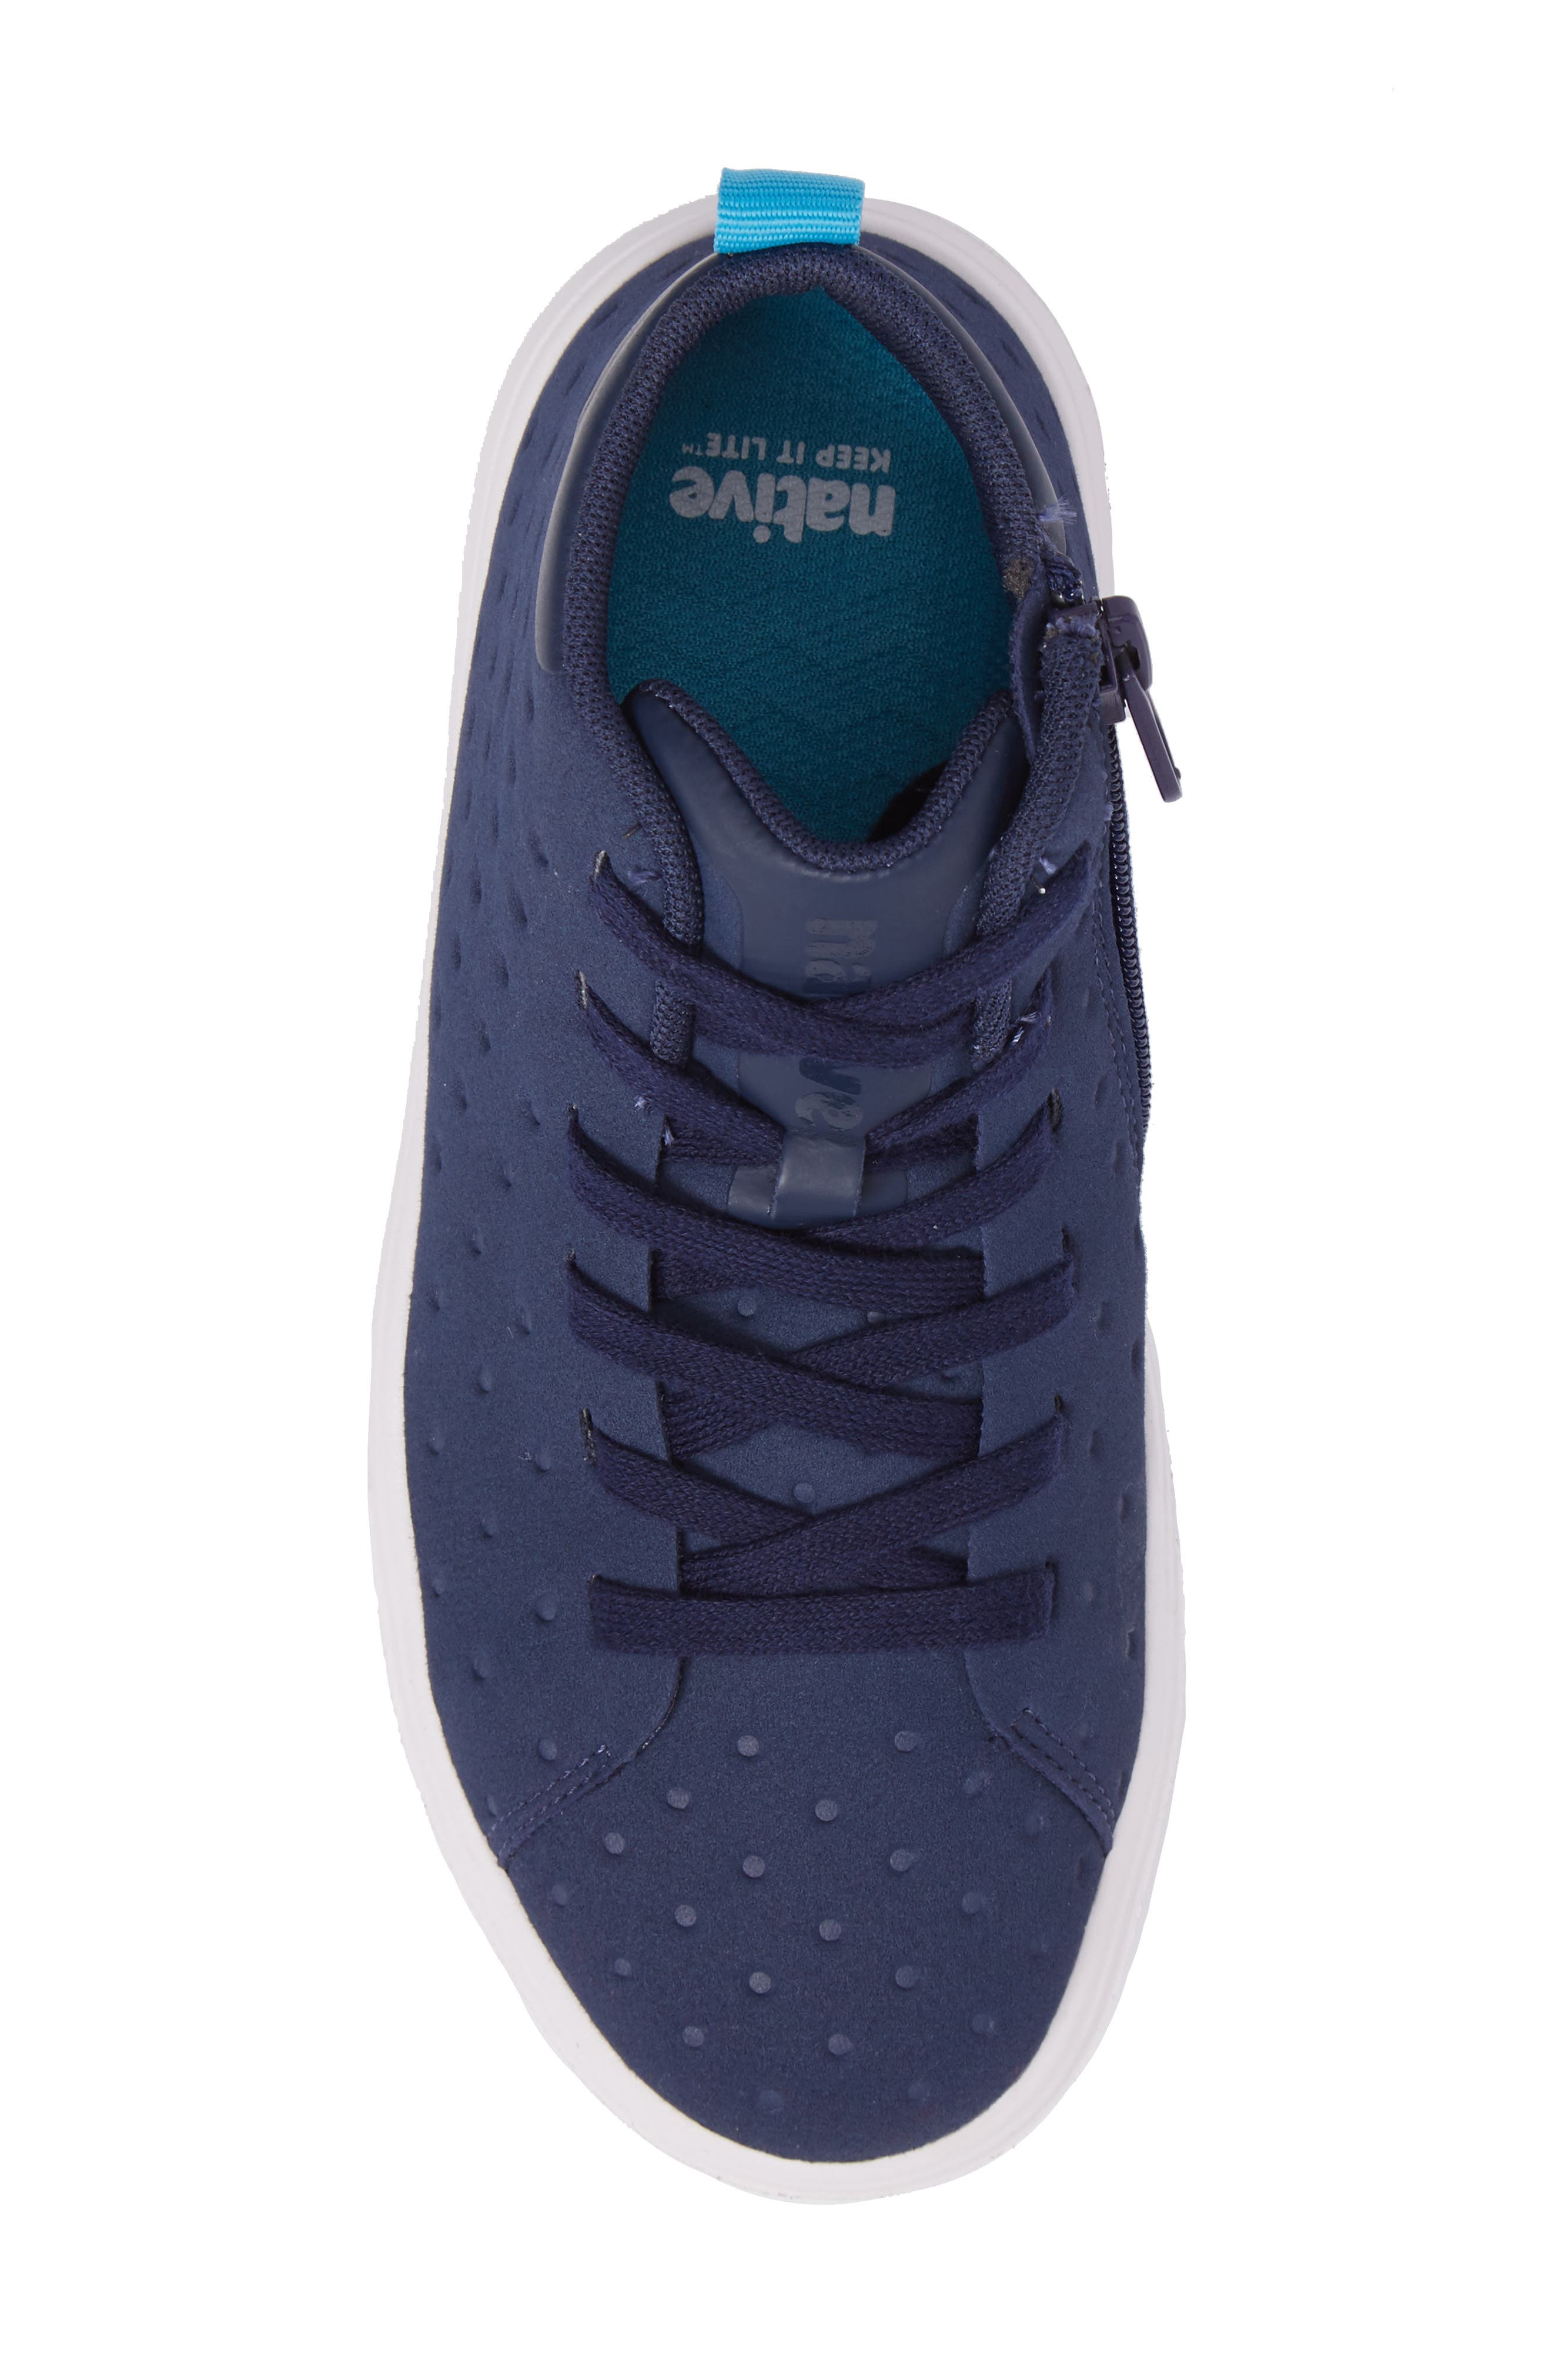 Native Monaco Sneaker,                             Alternate thumbnail 5, color,                             Regatta Blue/ Shell White